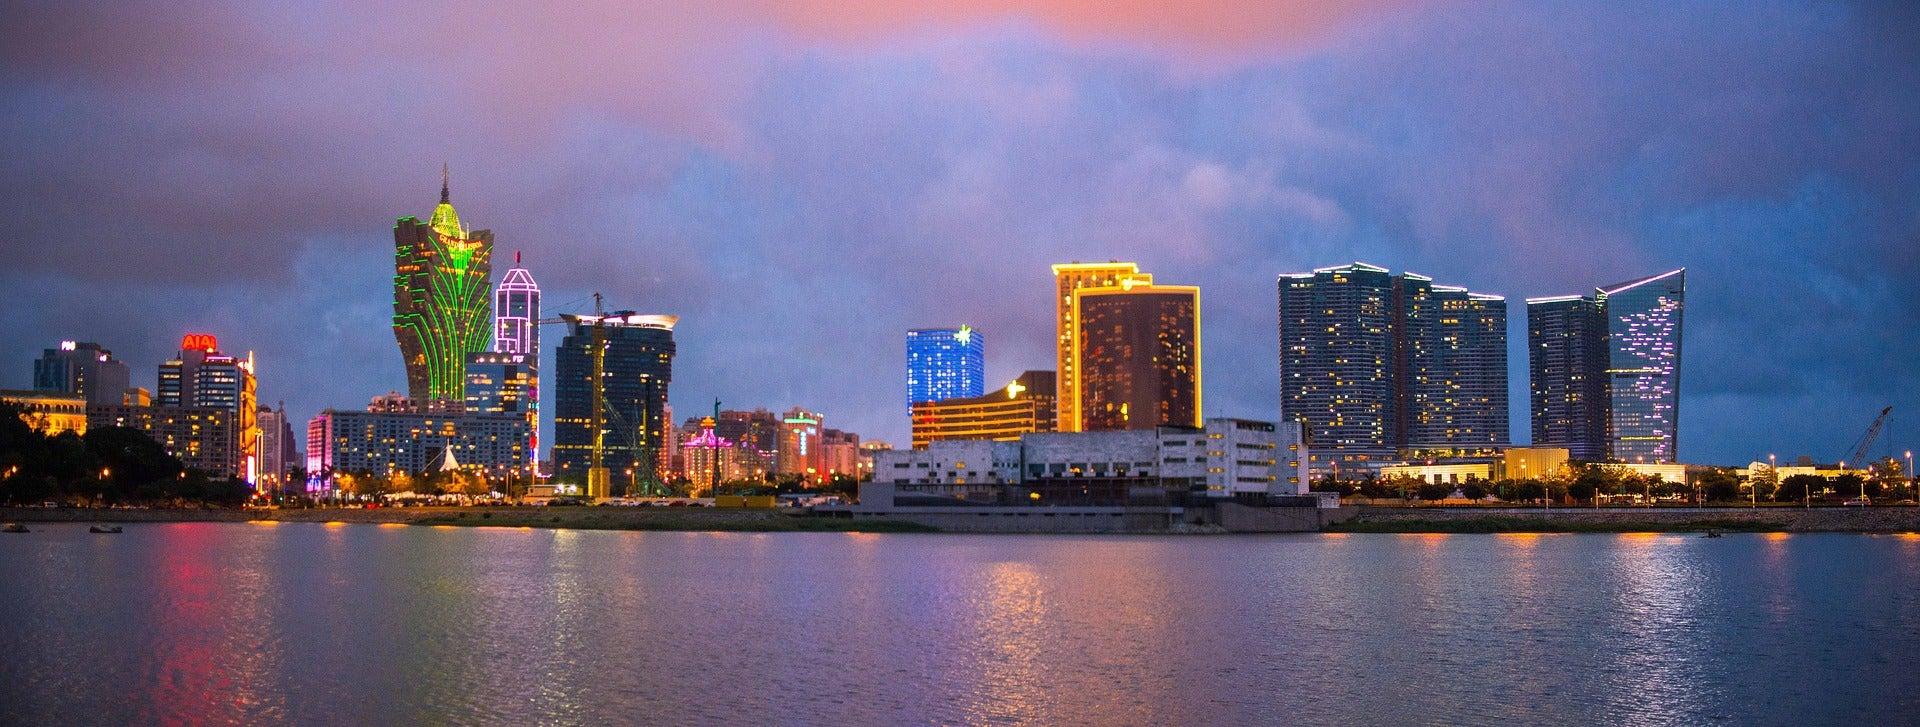 Macau casino etf winward casino complaints